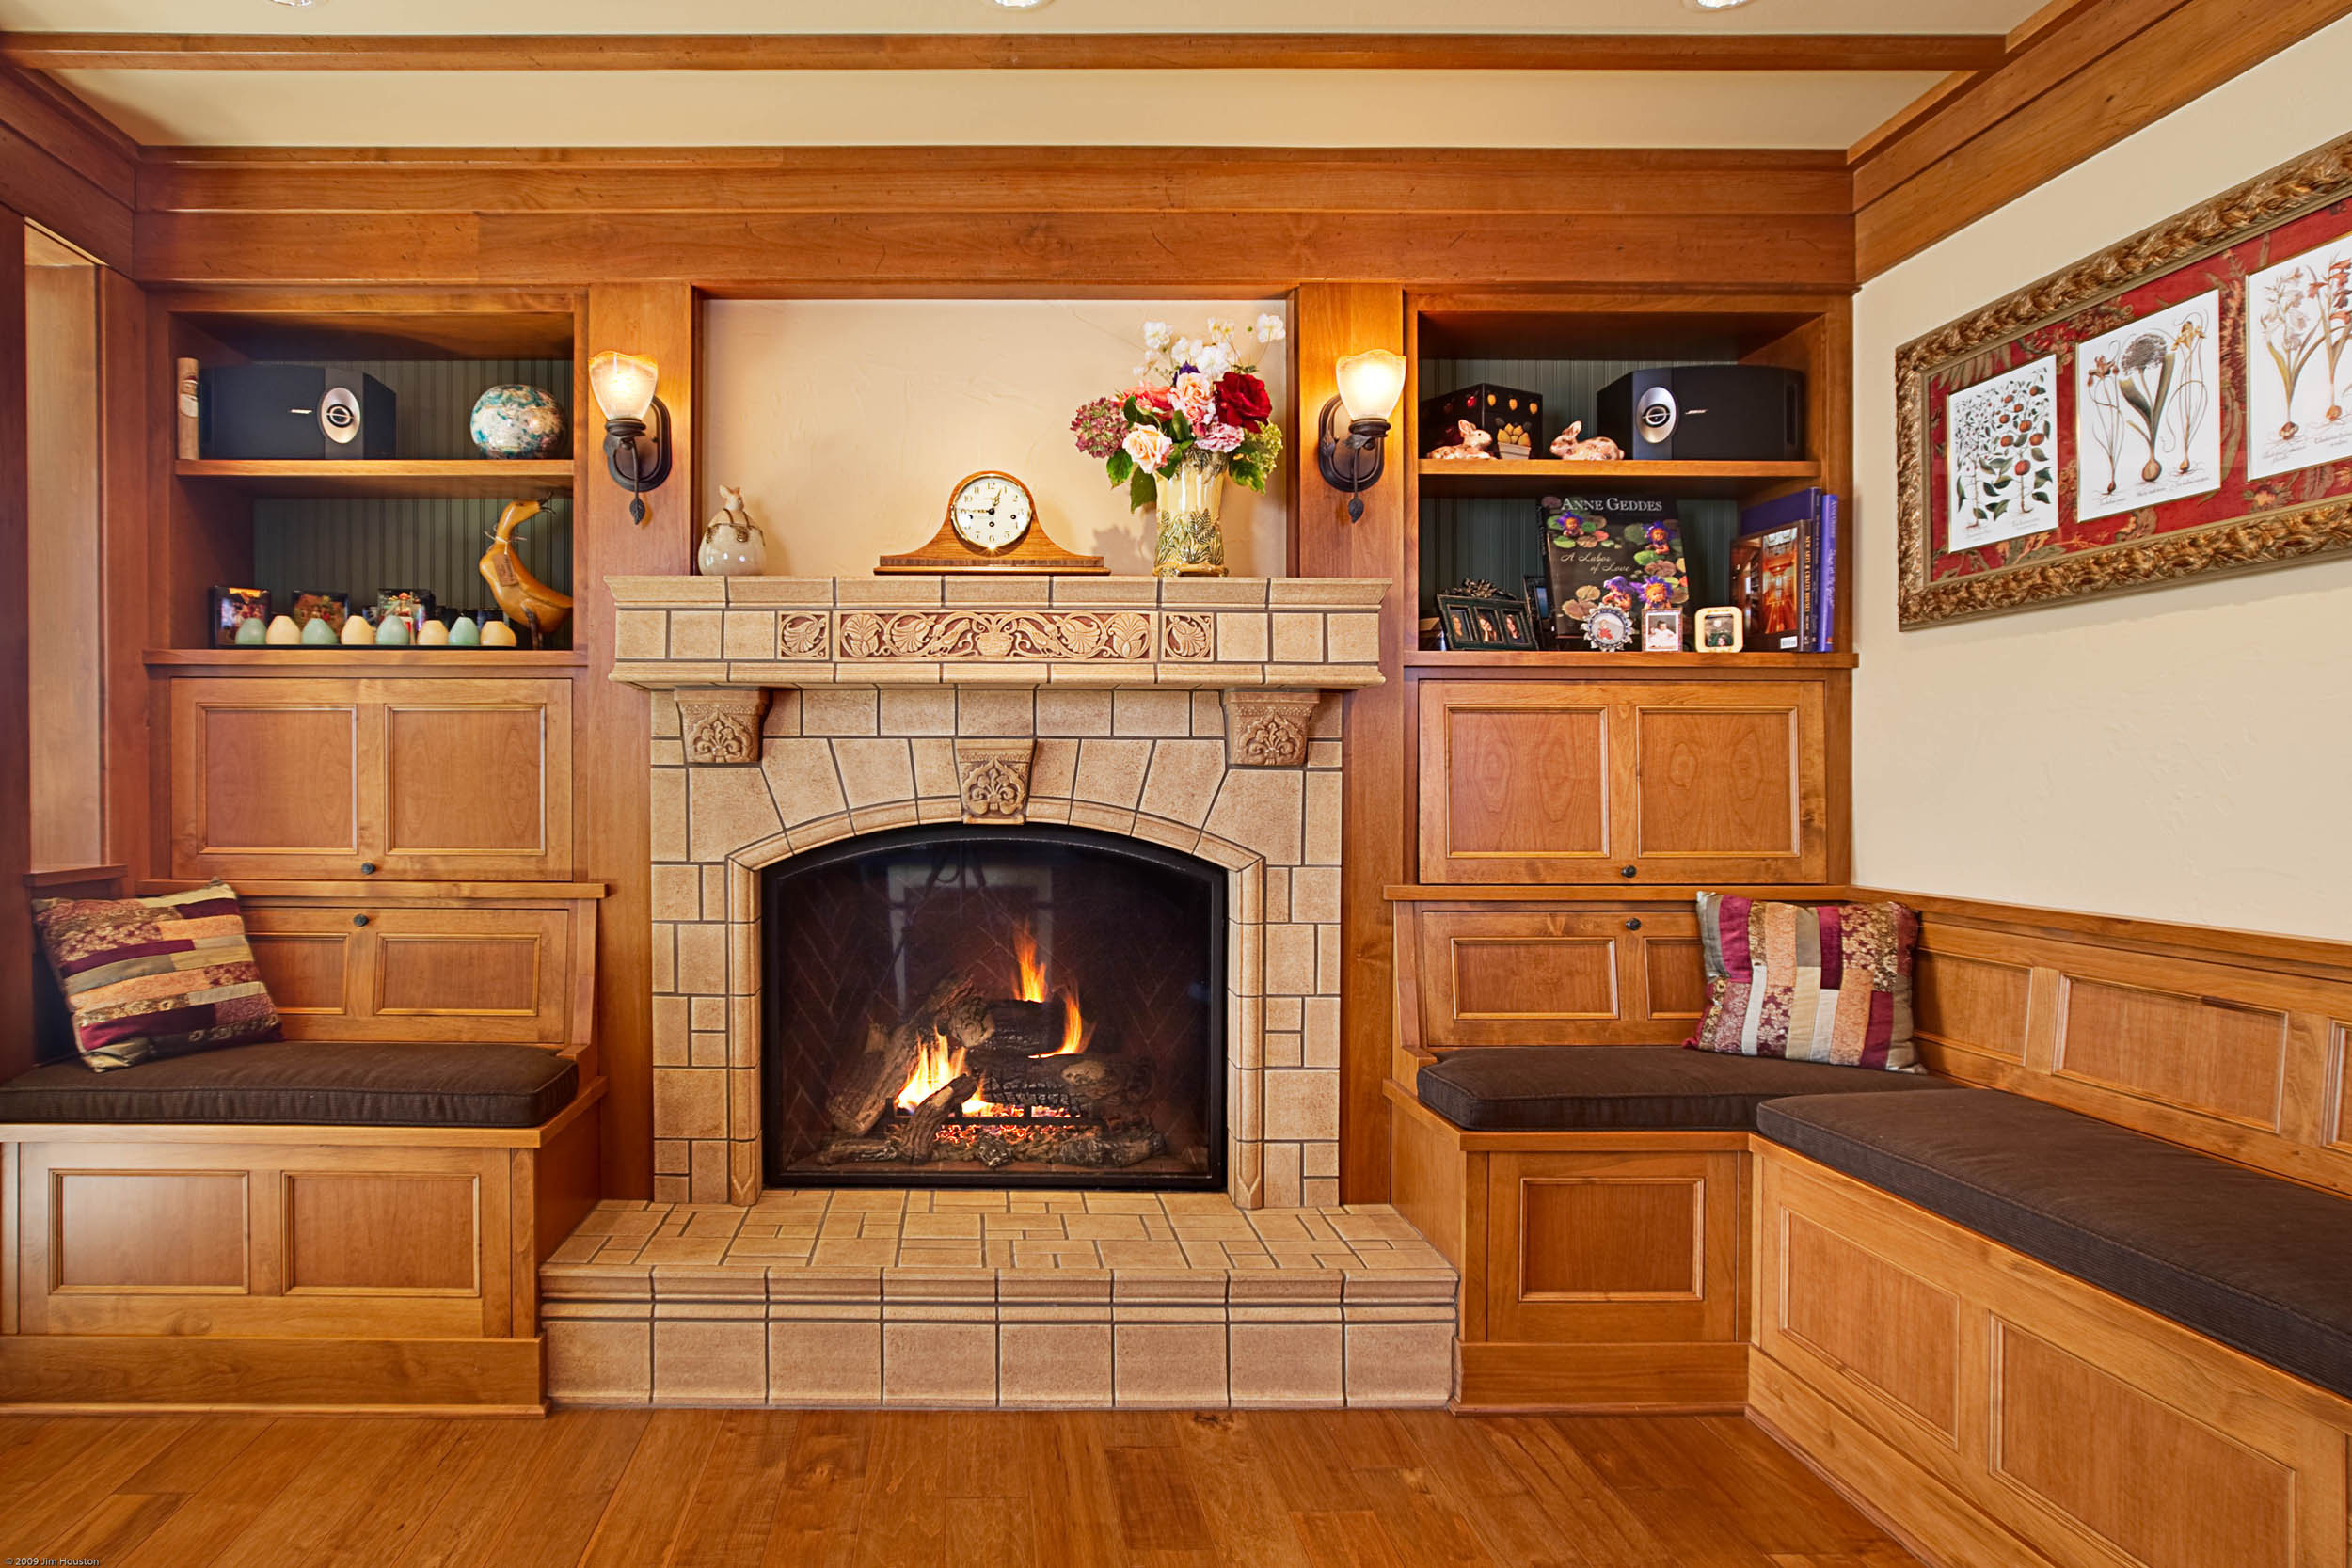 FFC_5026_Fireplace.jpg